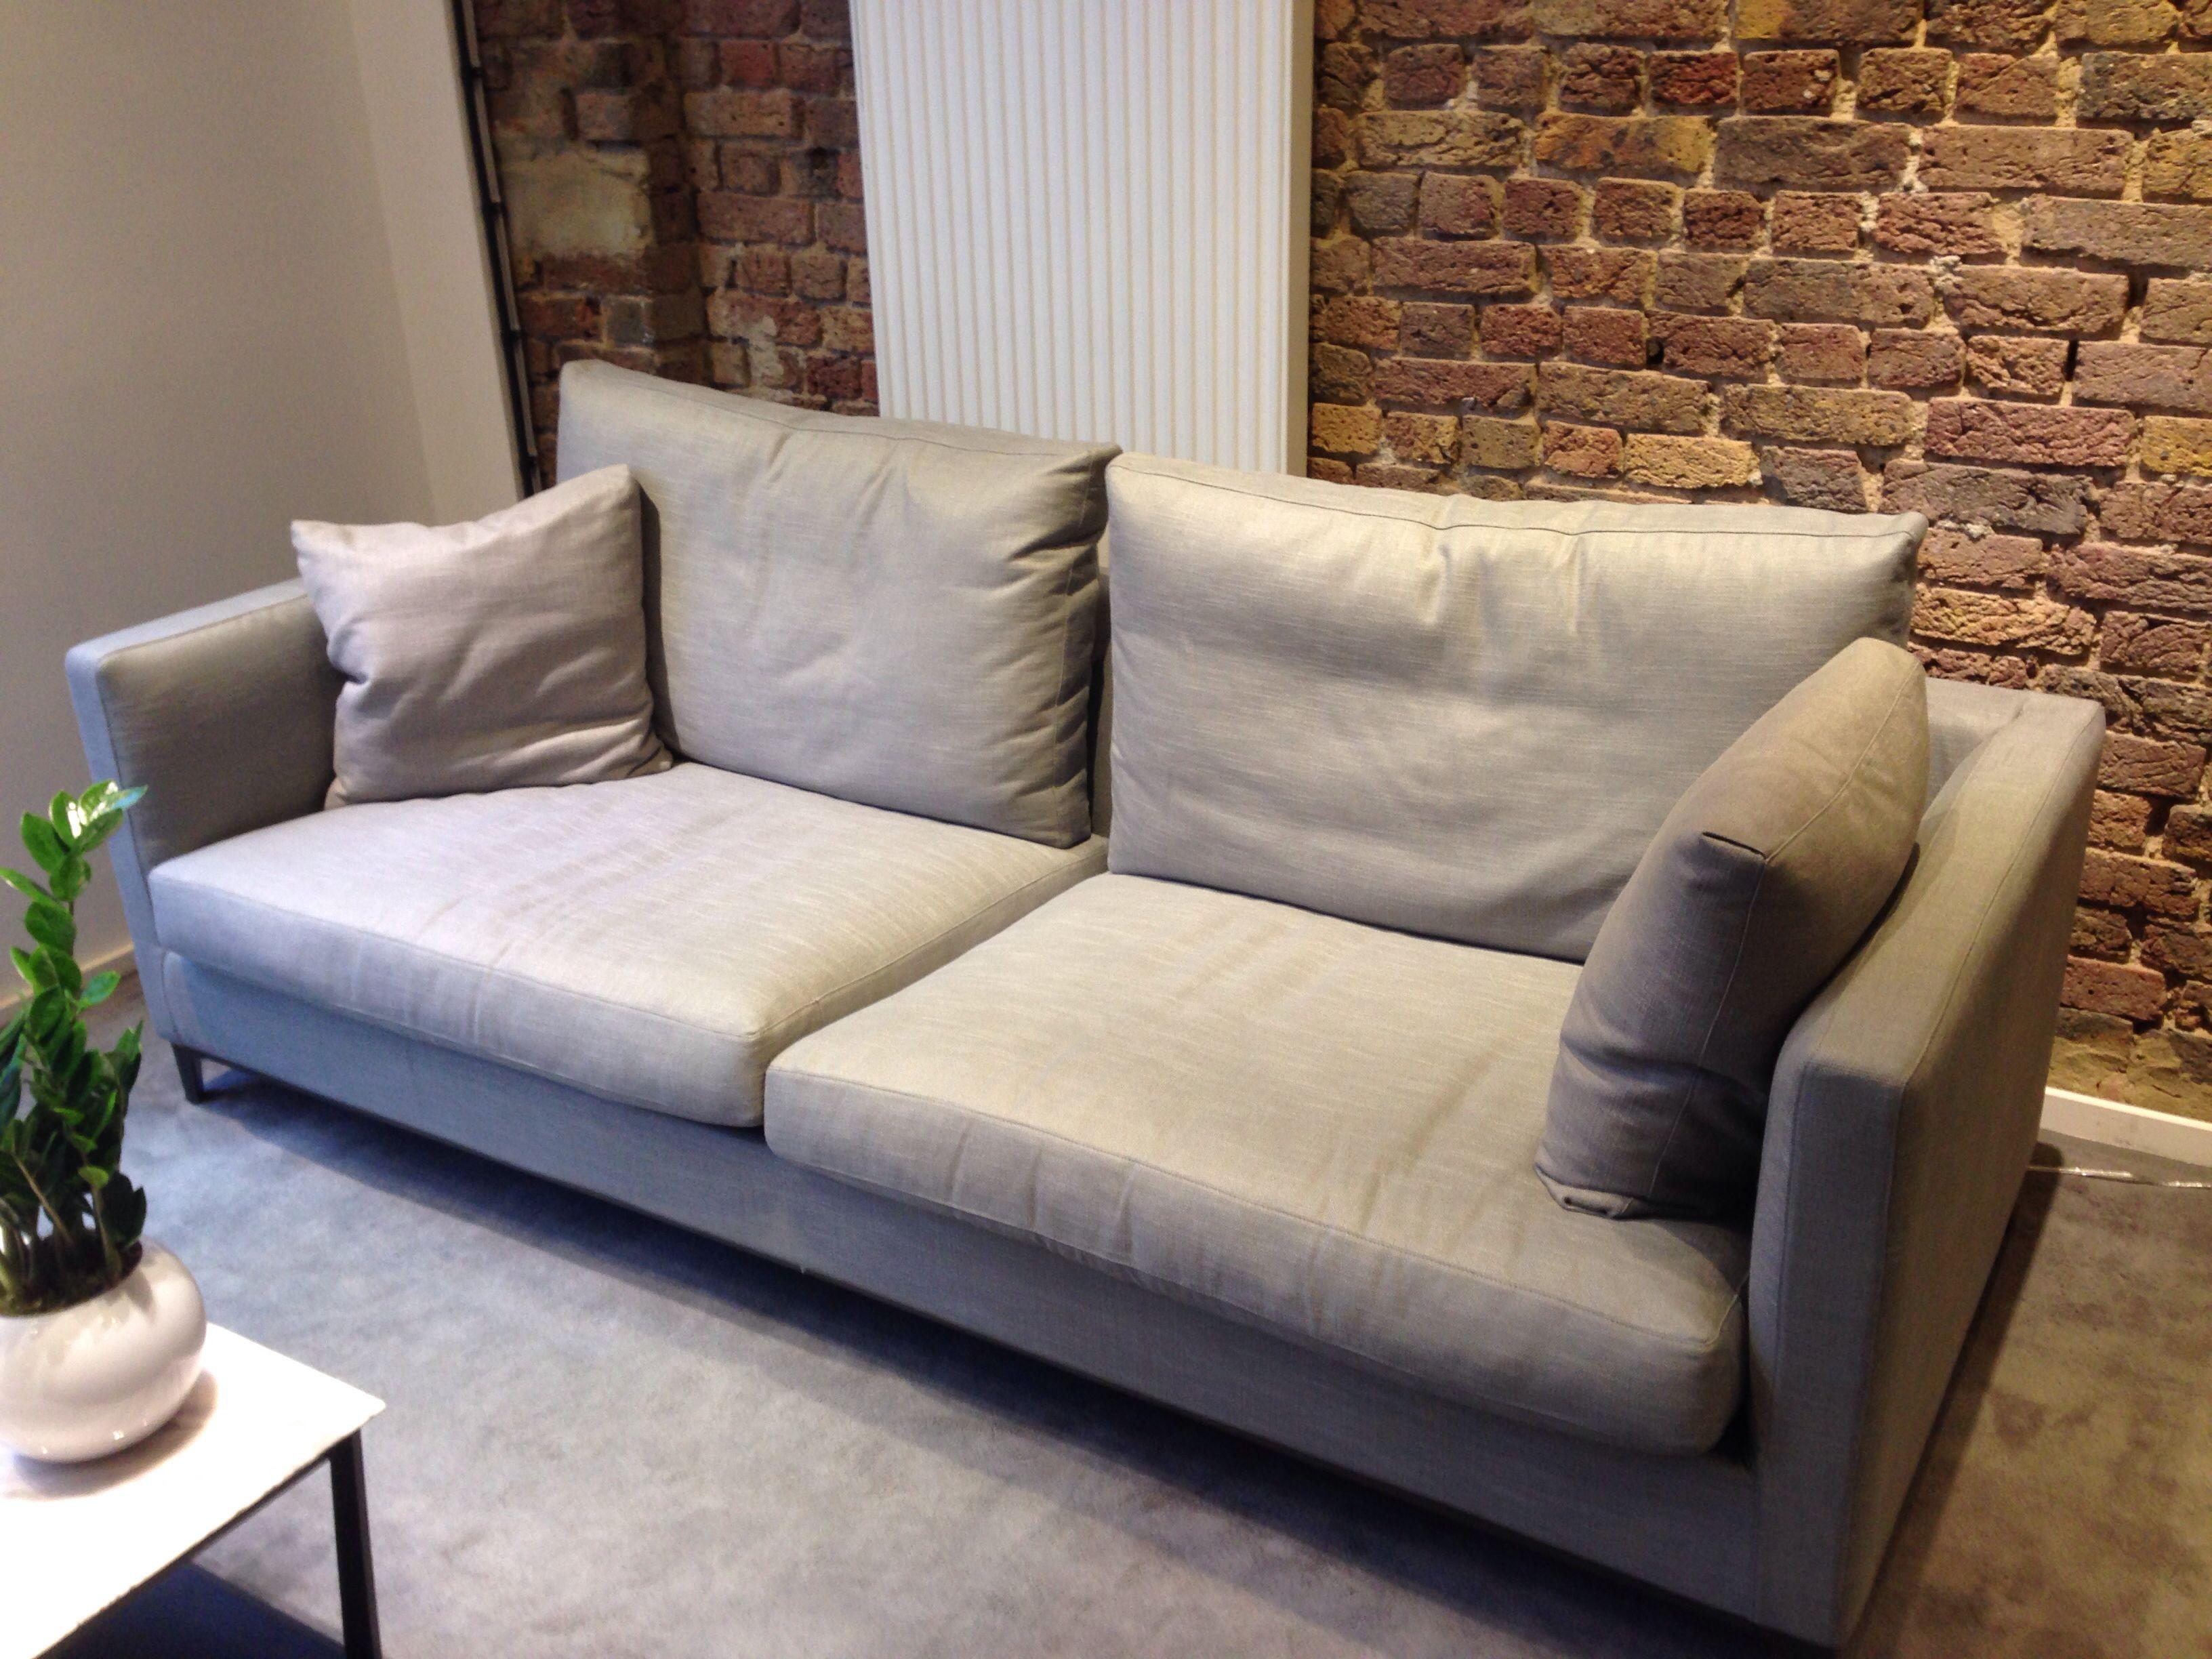 Crescent Sofa Camerich Leather Sectional Portland Oregon Bed Baci Living Room